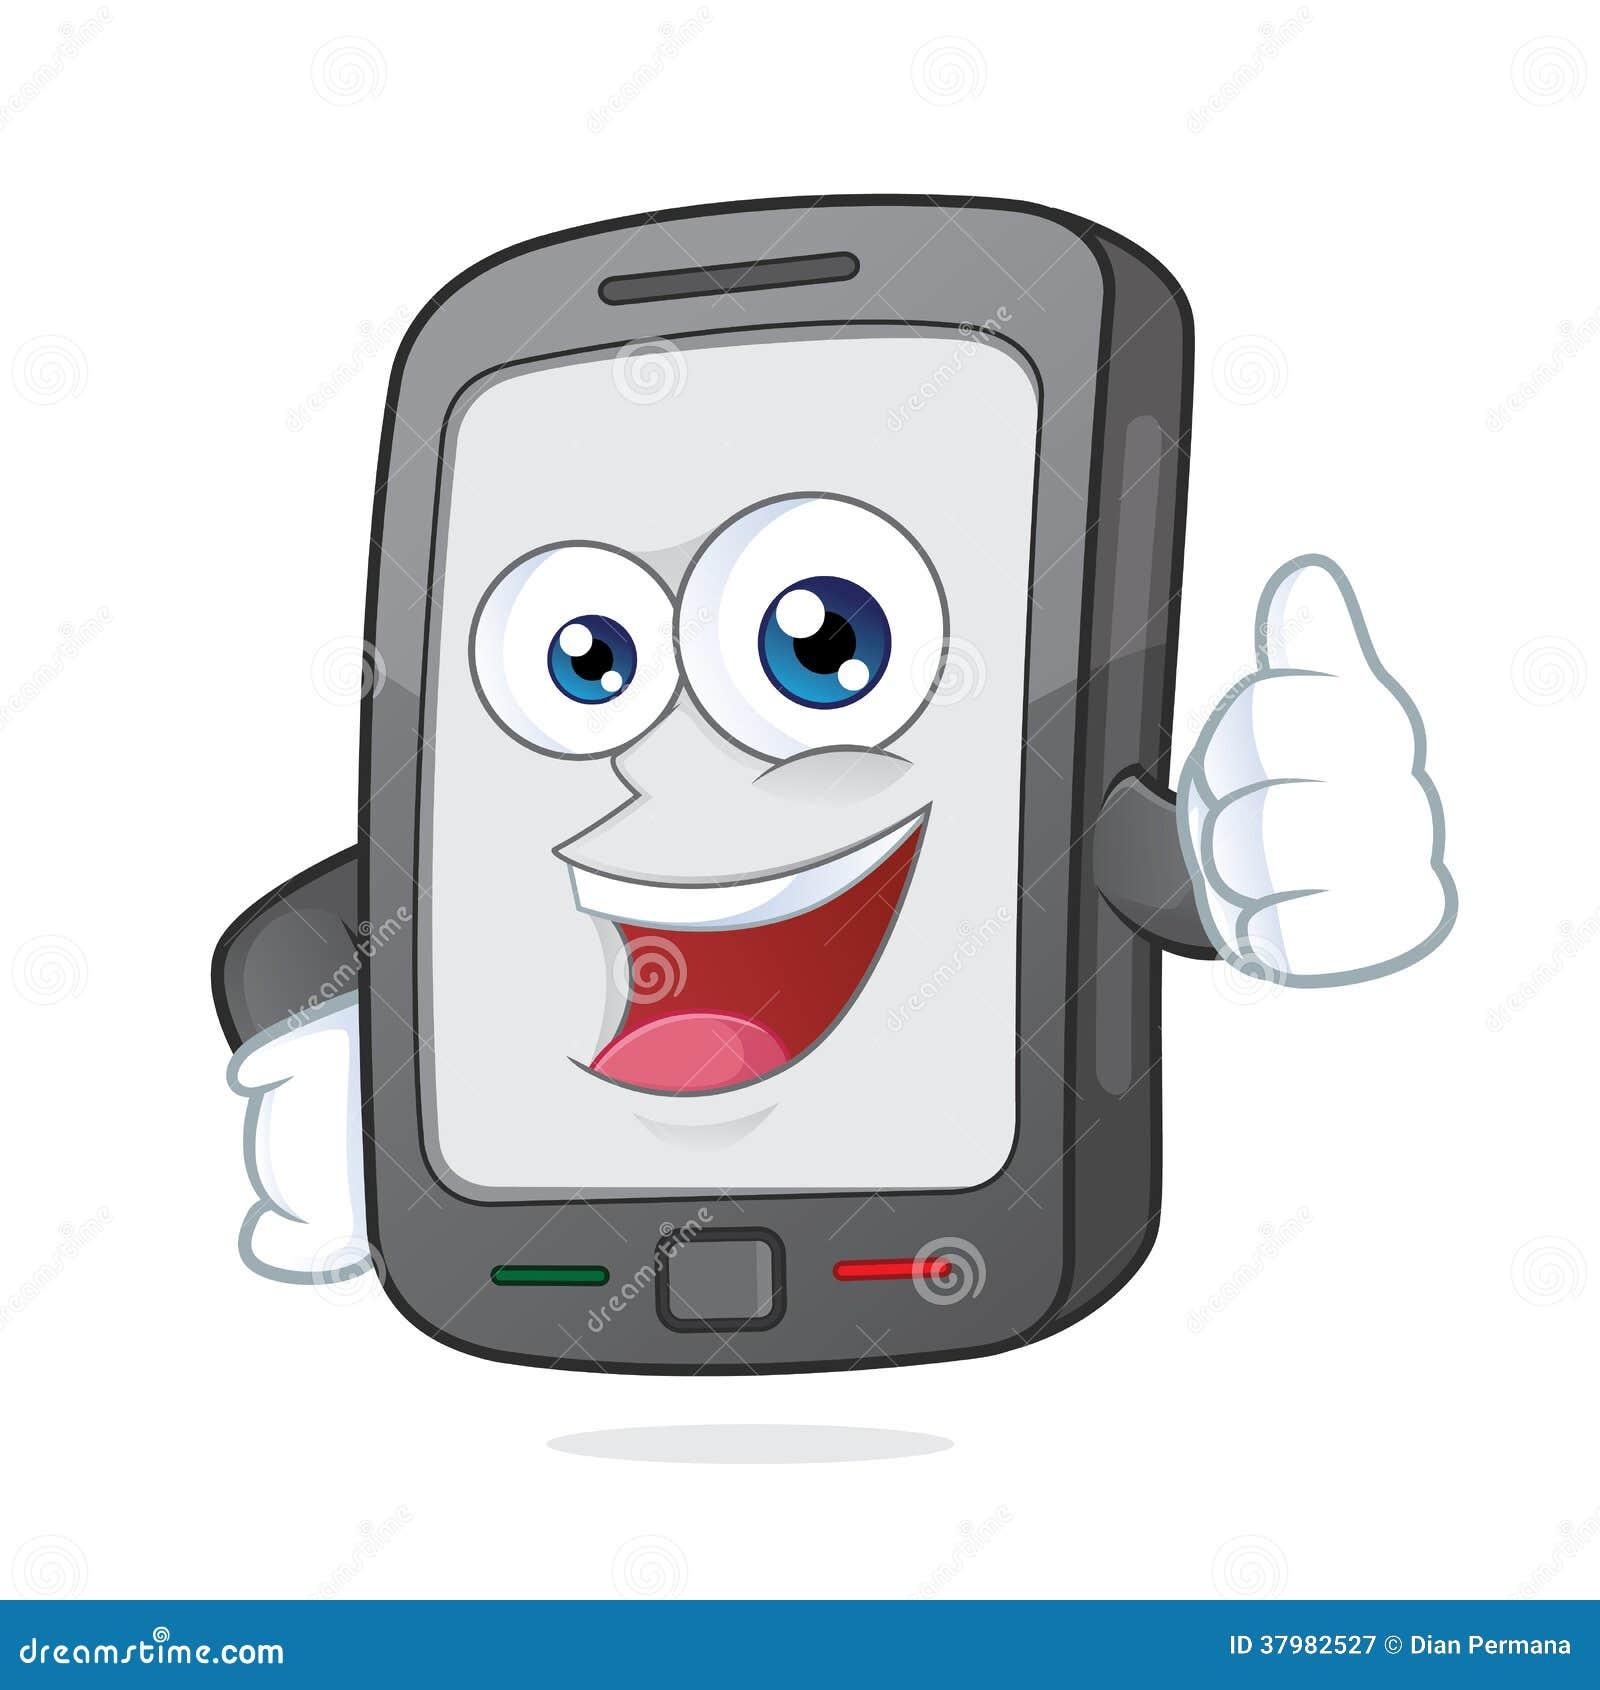 smartphone clipart - photo #43